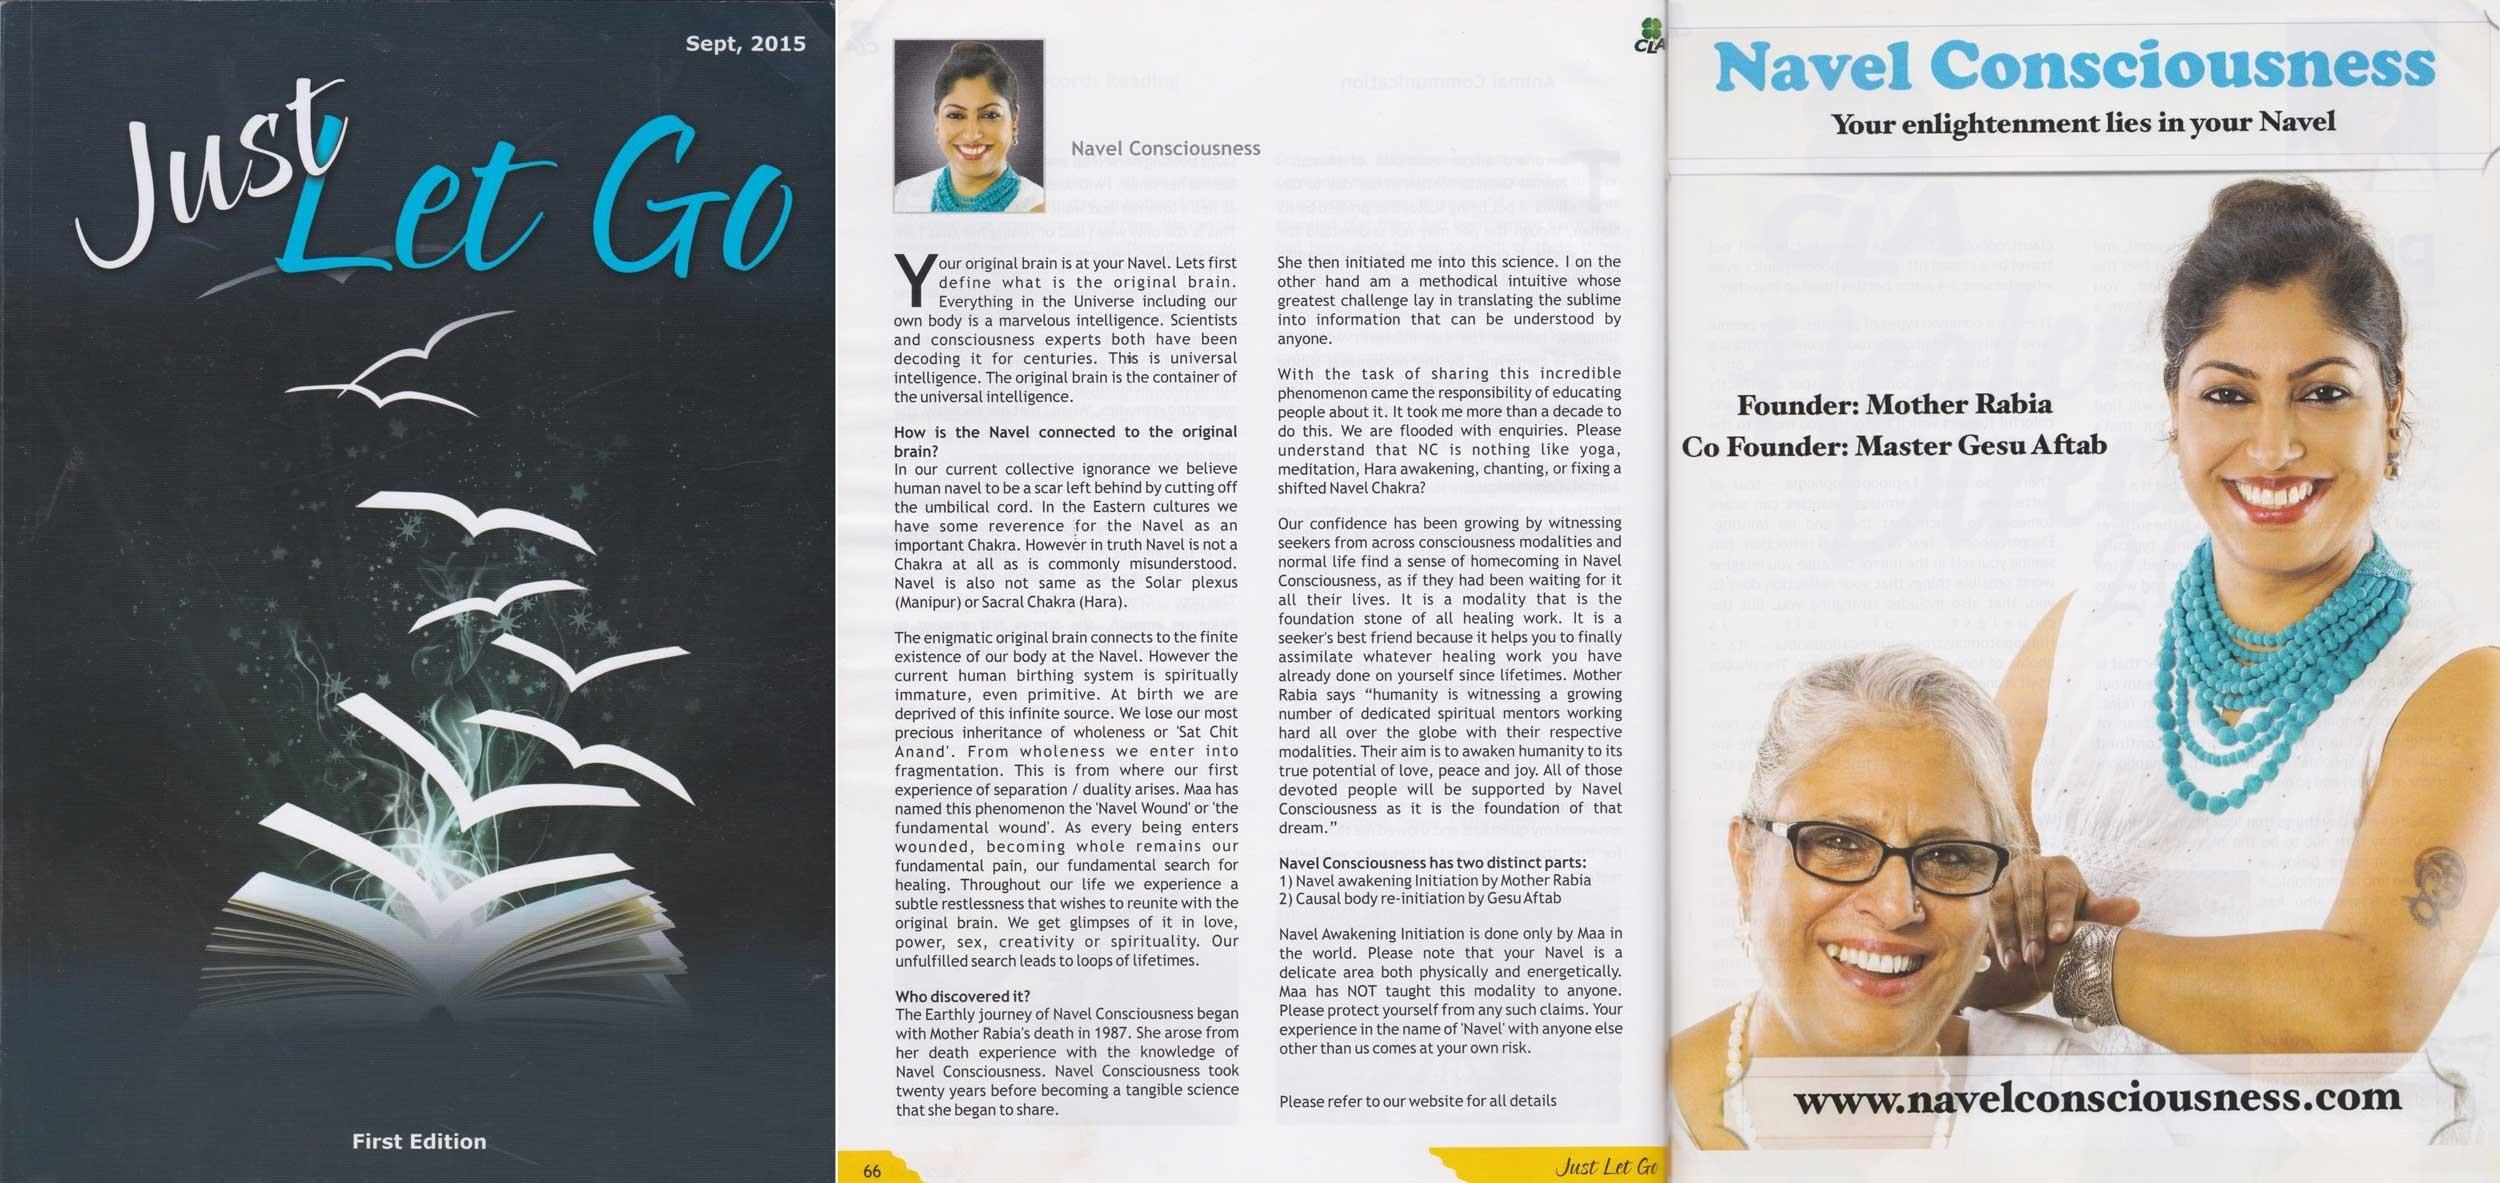 Navel Consciousness founder Udumbara Gesu and Navel Awakening Initiation founder Mother Rabiya in Let it go magazine in 2015